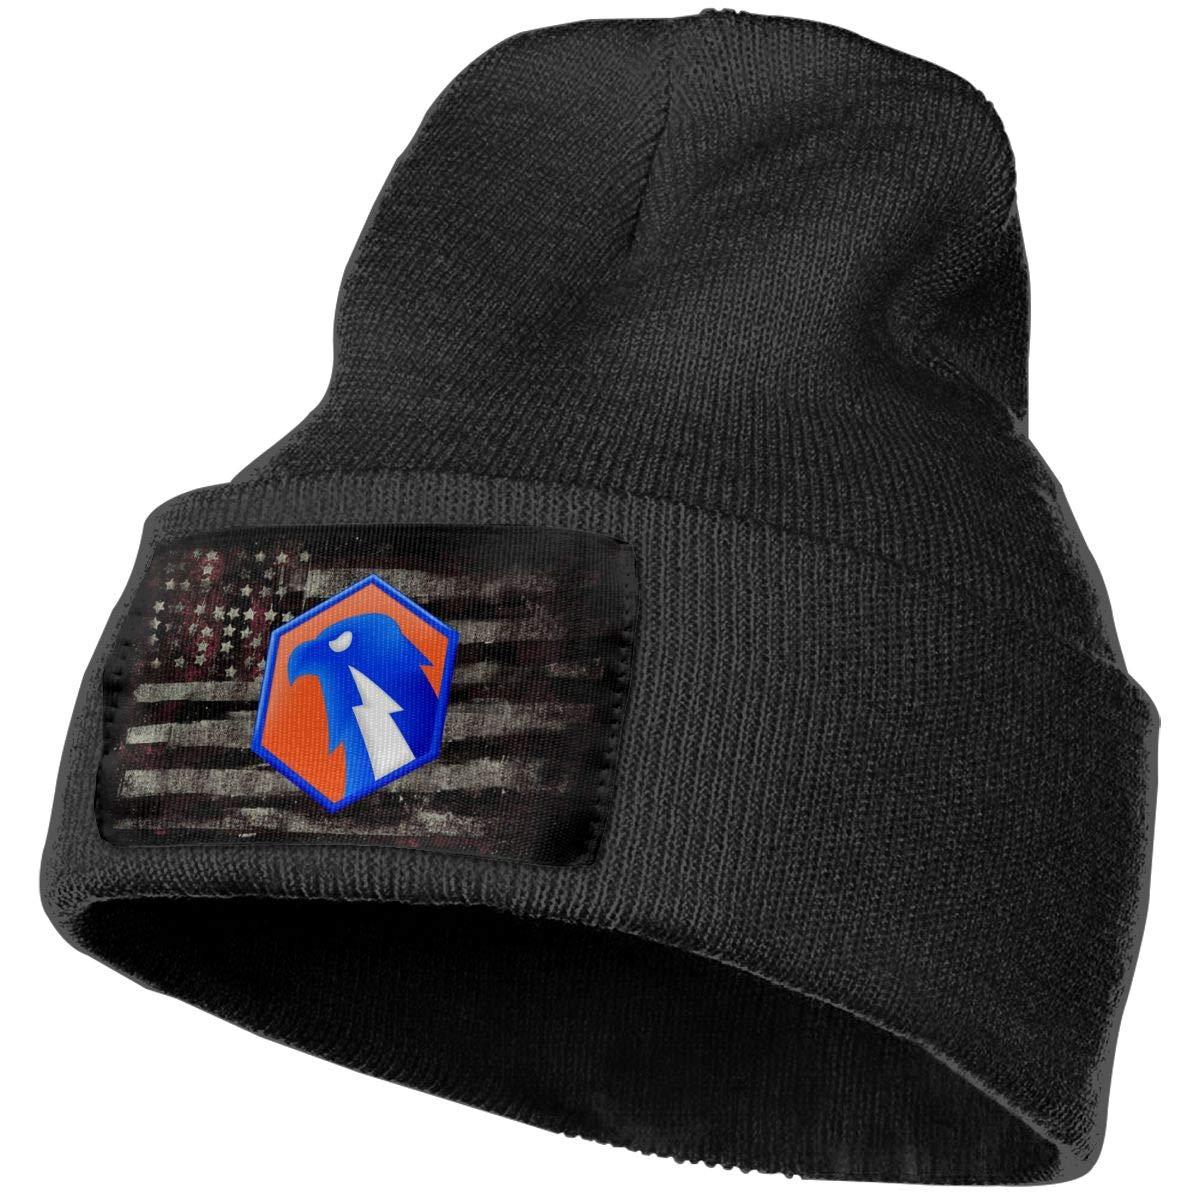 US Army 6th Signal Command Mens Beanie Cap Skull Cap Winter Warm Knitting Hats.